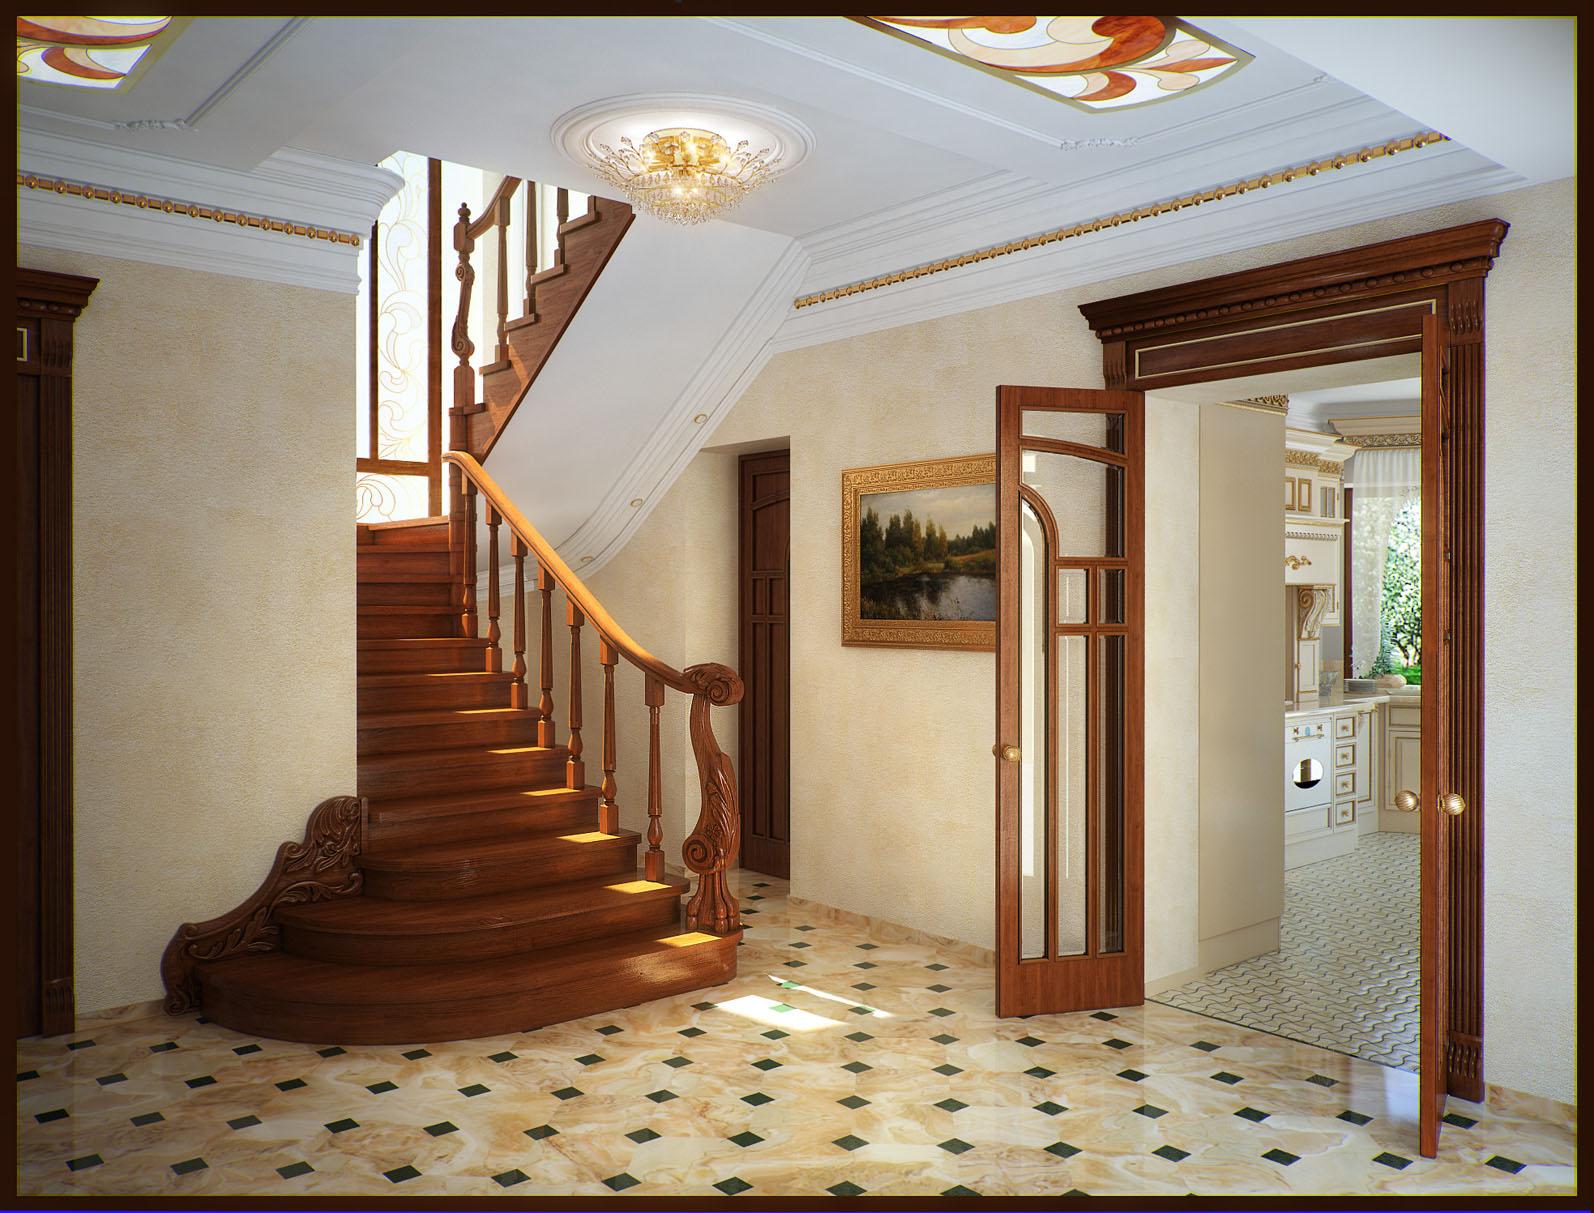 самым происходит дизайн холла с лестницей фото архитектуре